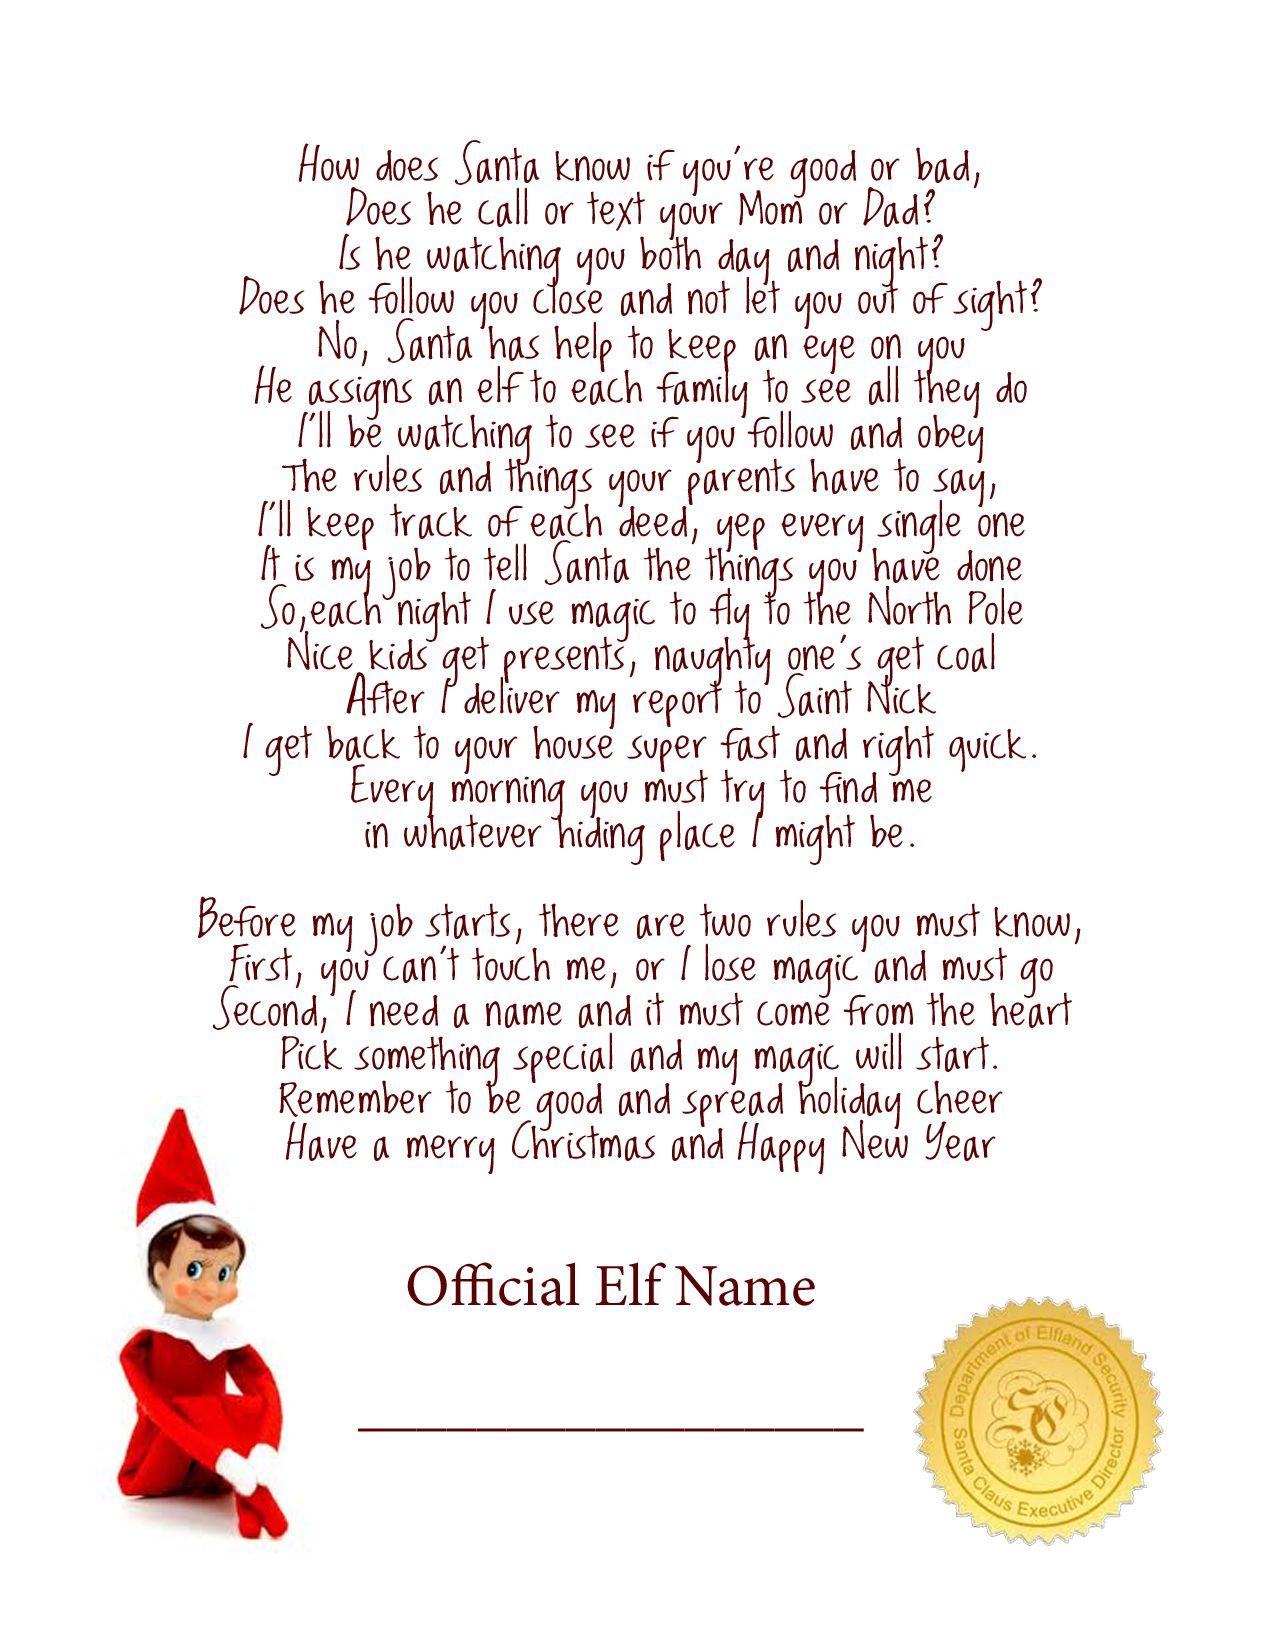 Elf On The Shelf Story - Free Printable Poem   Elf On The Shelf - Free Printable Elf On The Shelf Story